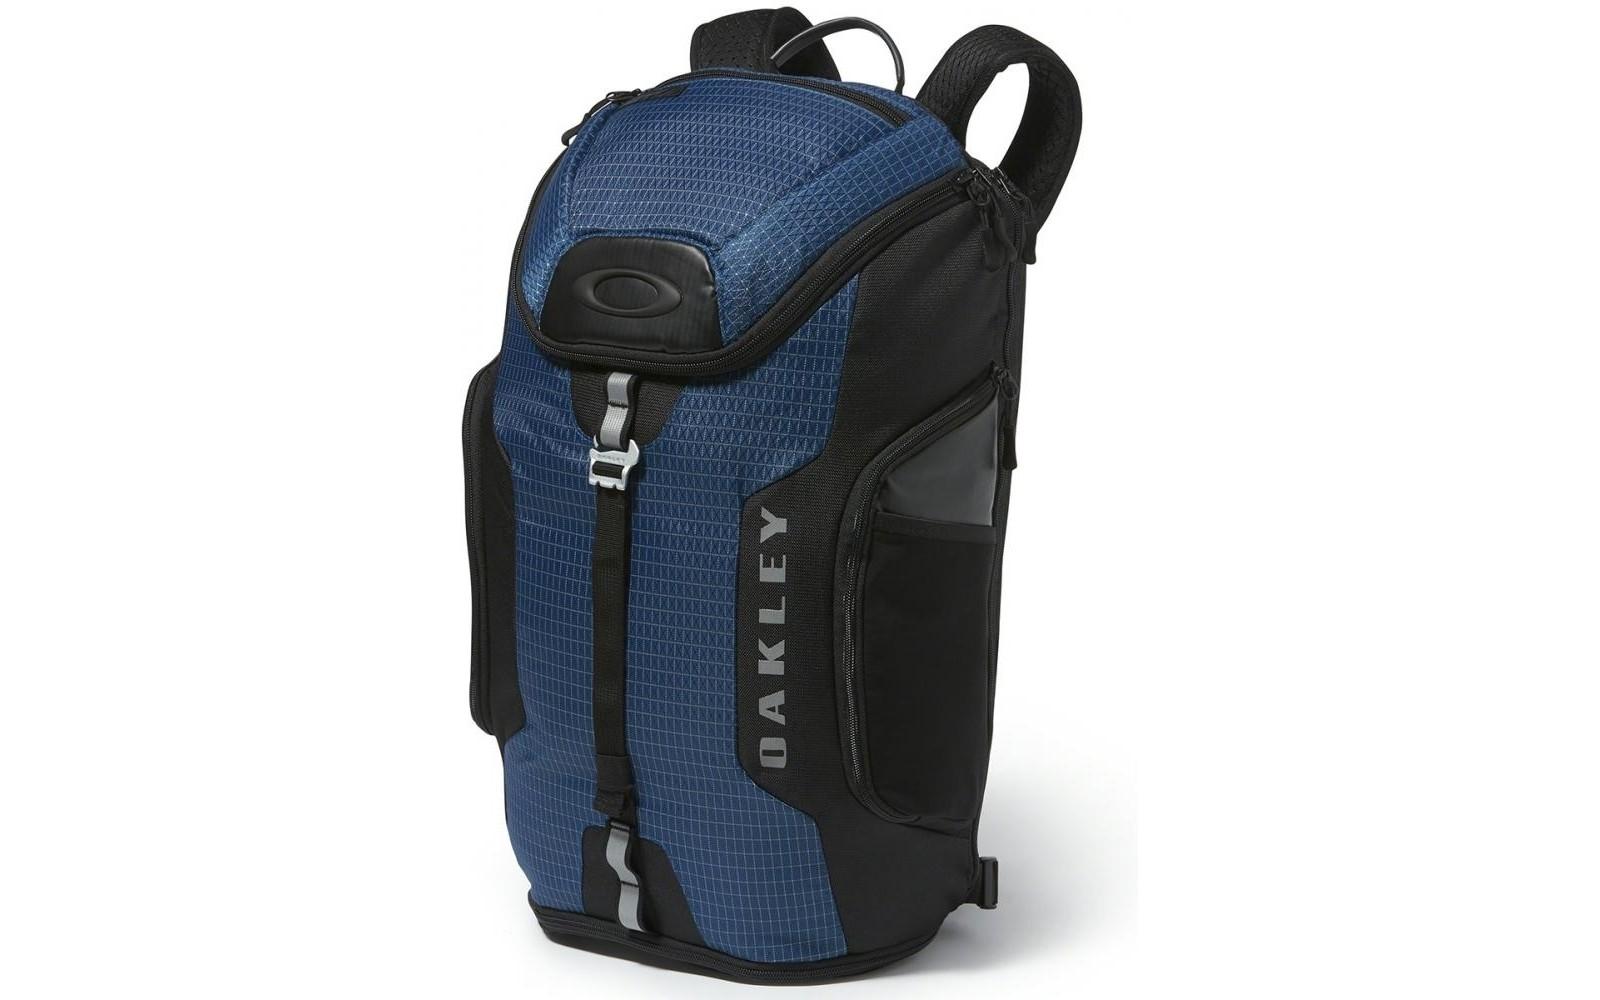 Oakley Link Backpack - Poseidon - 92910-6A1 Rugzak